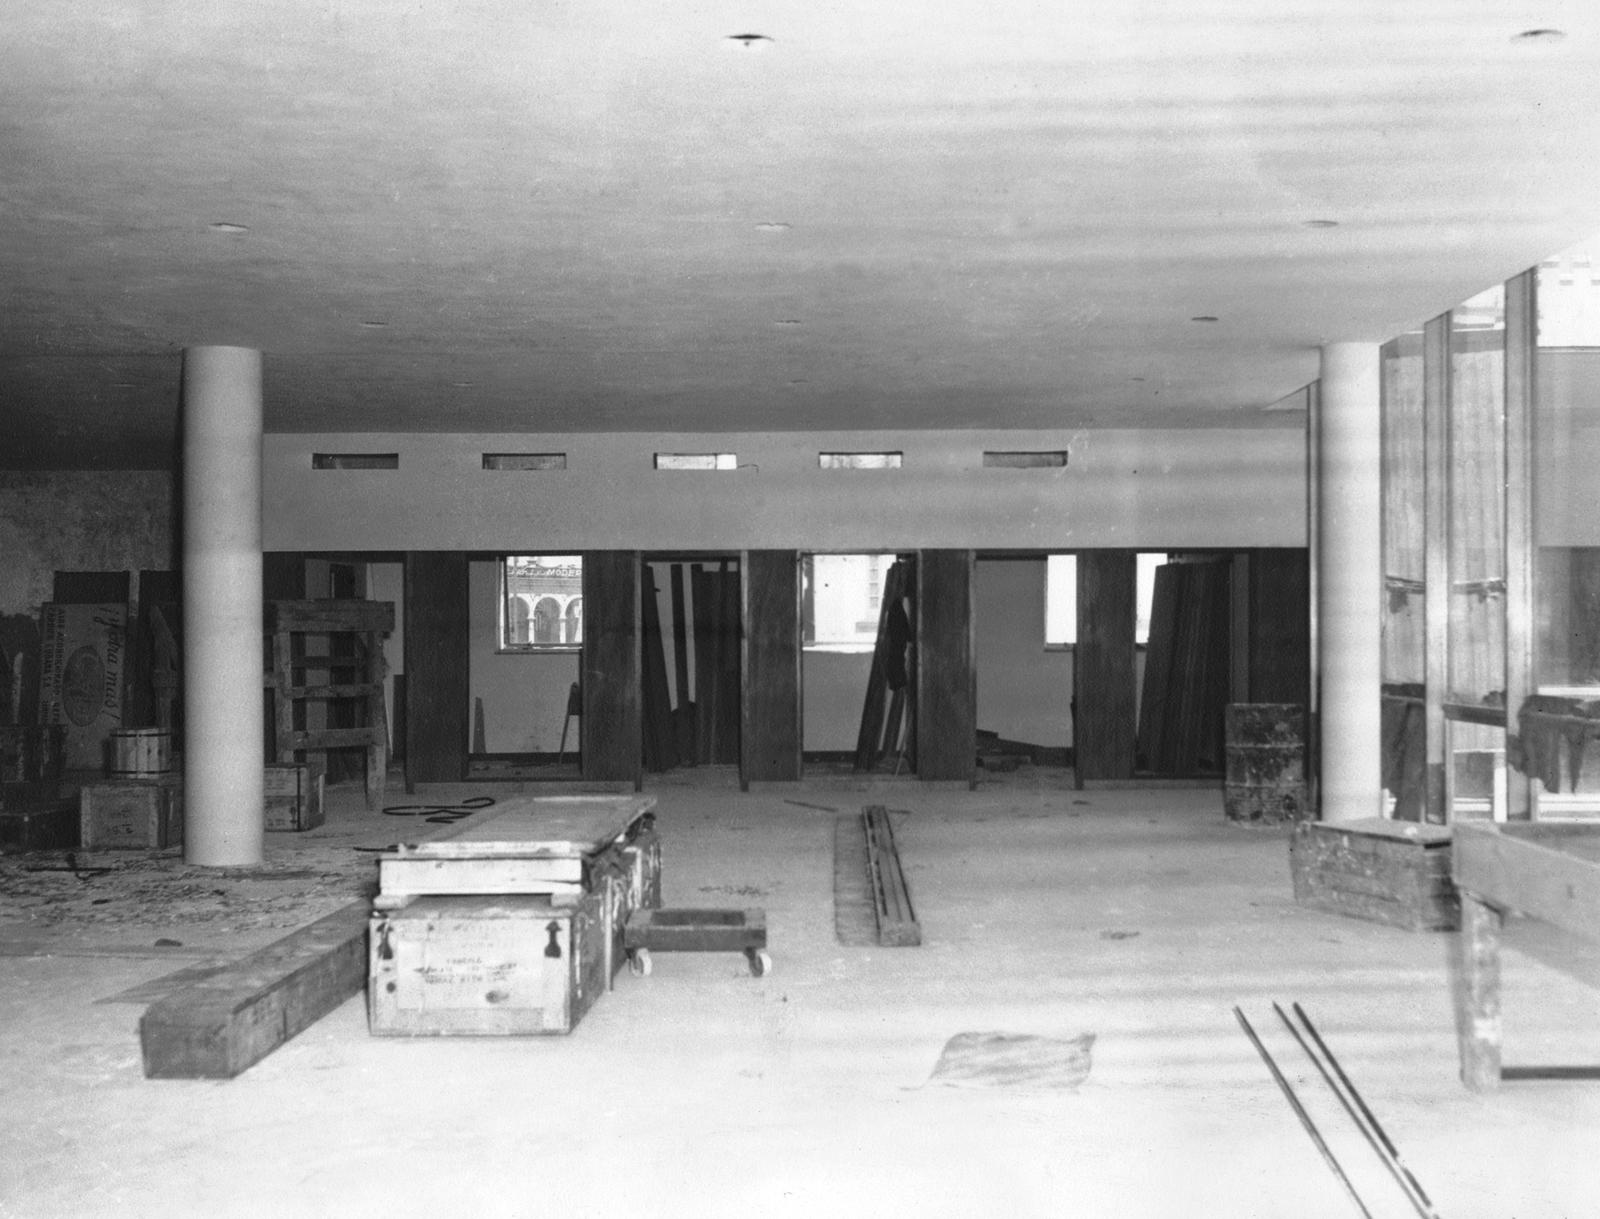 Havana - Chancery Office Building - 1952